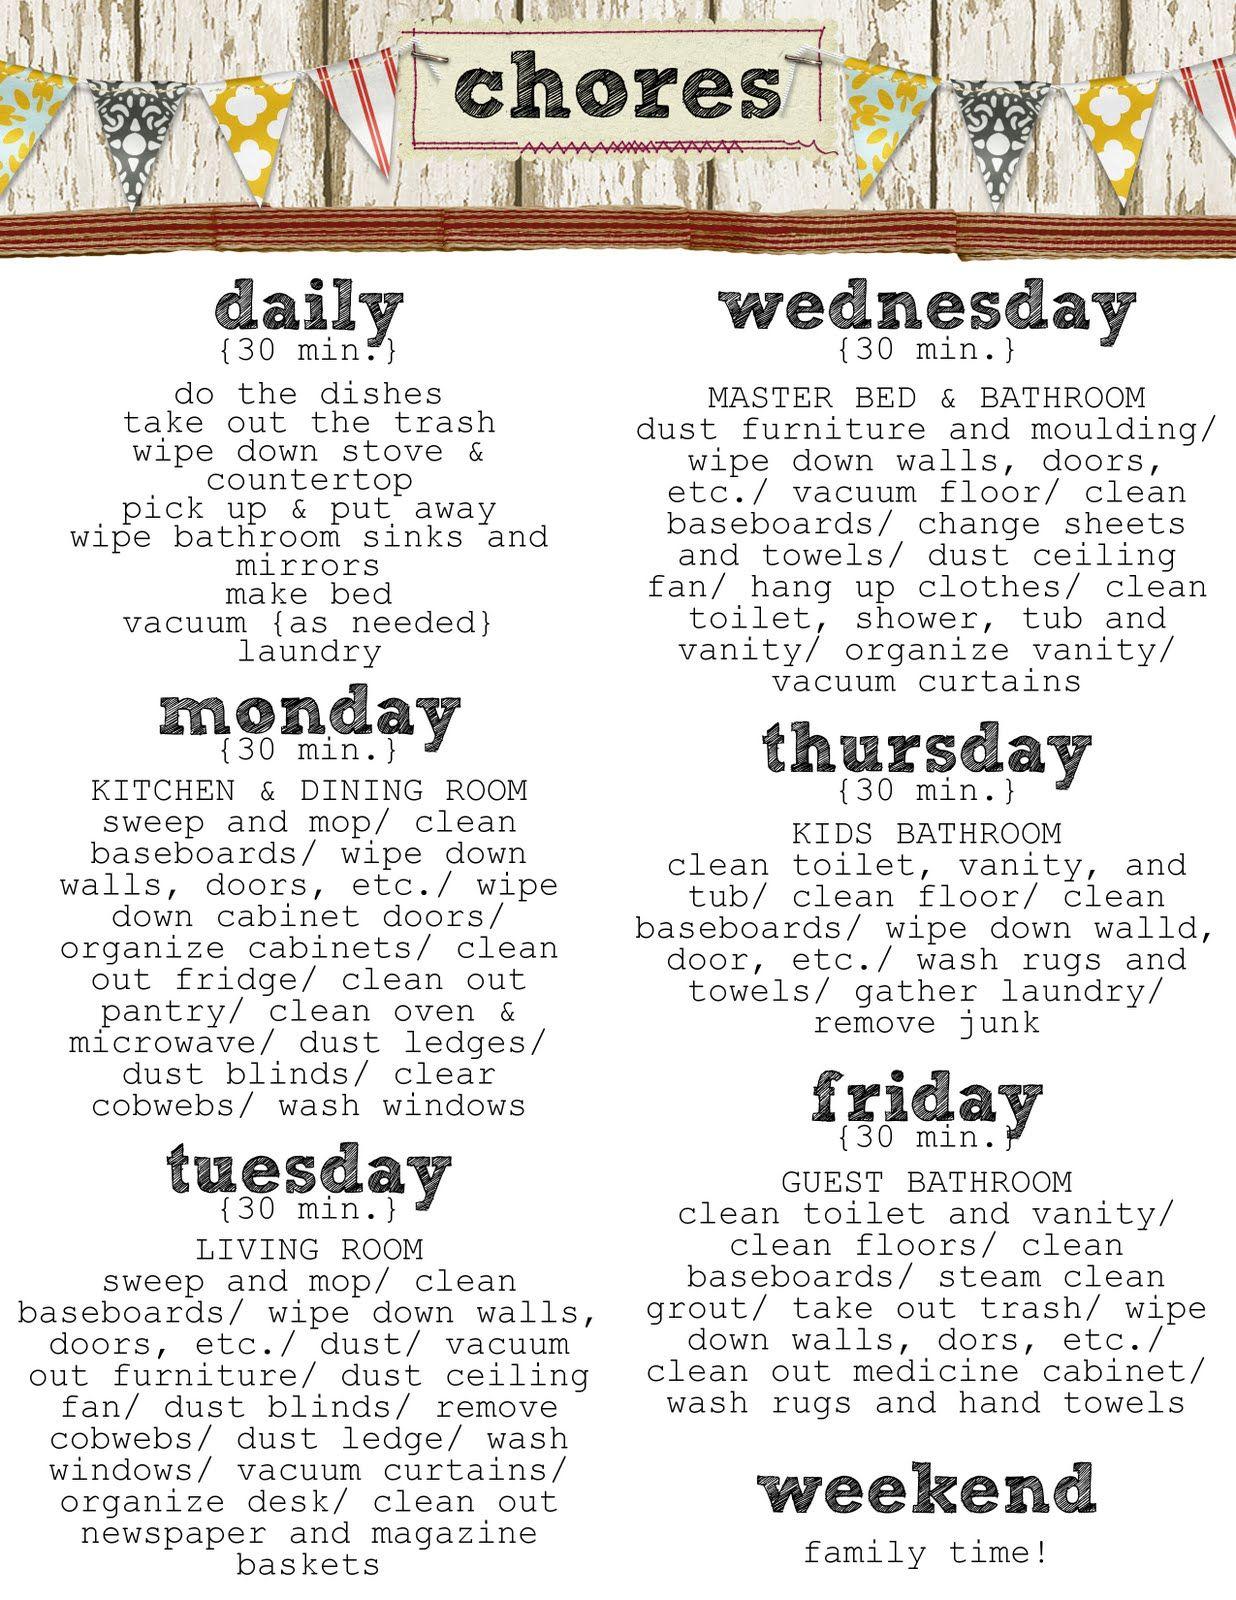 Daily Household Chores Checklist | April Calendar | April Calendar